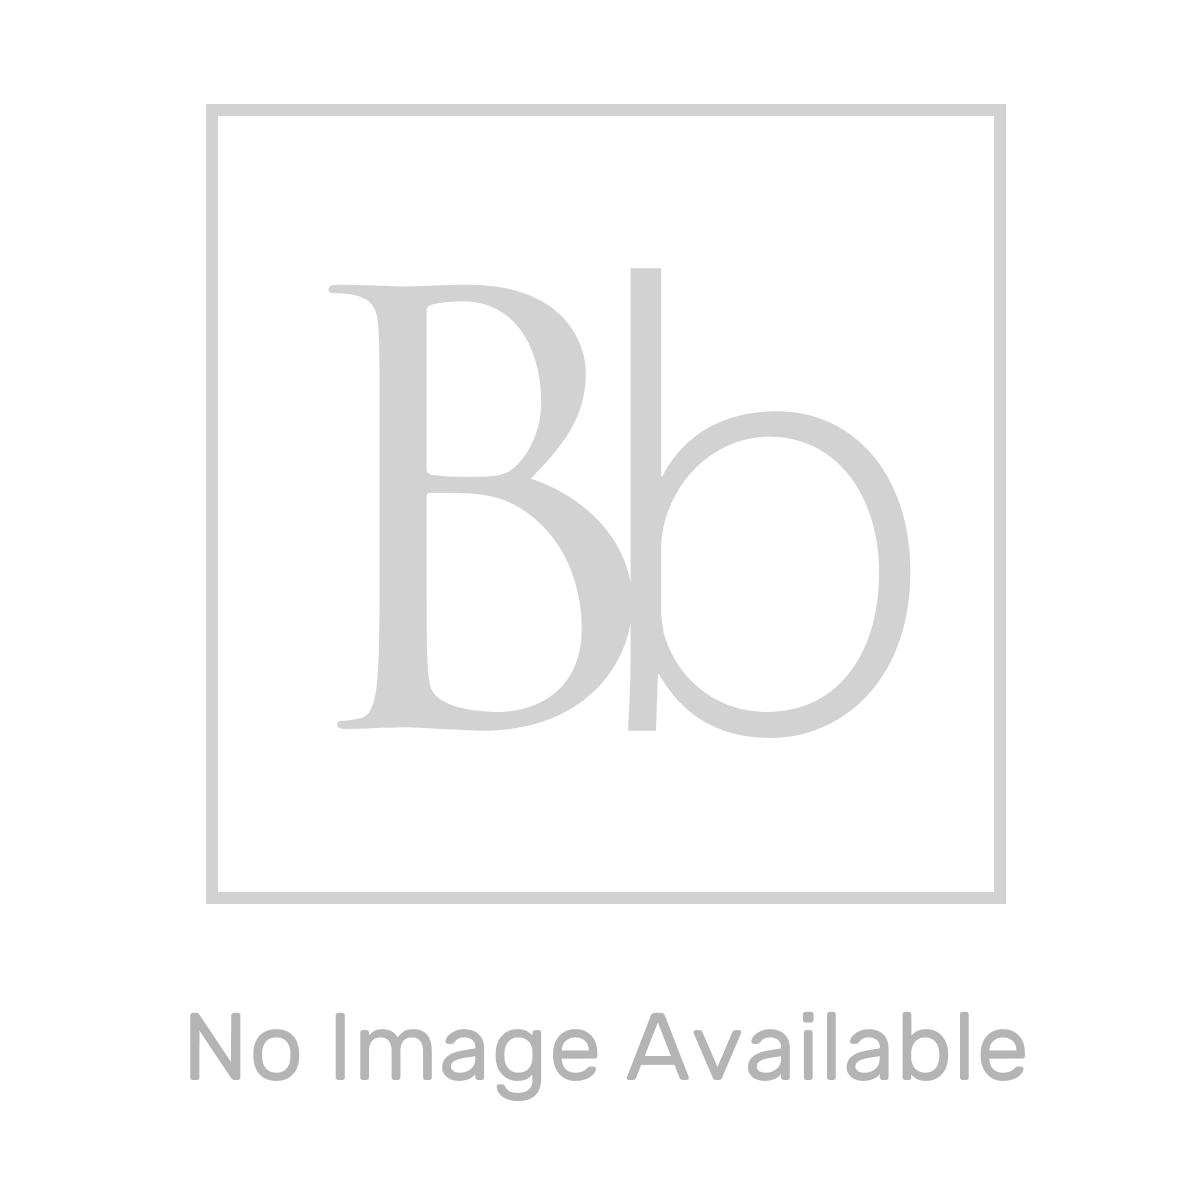 Nuie Athena Gloss Grey Mist 2 Door Floor Standing Vanity Unit with 18mm Profile Basin 500mm Line Drawing